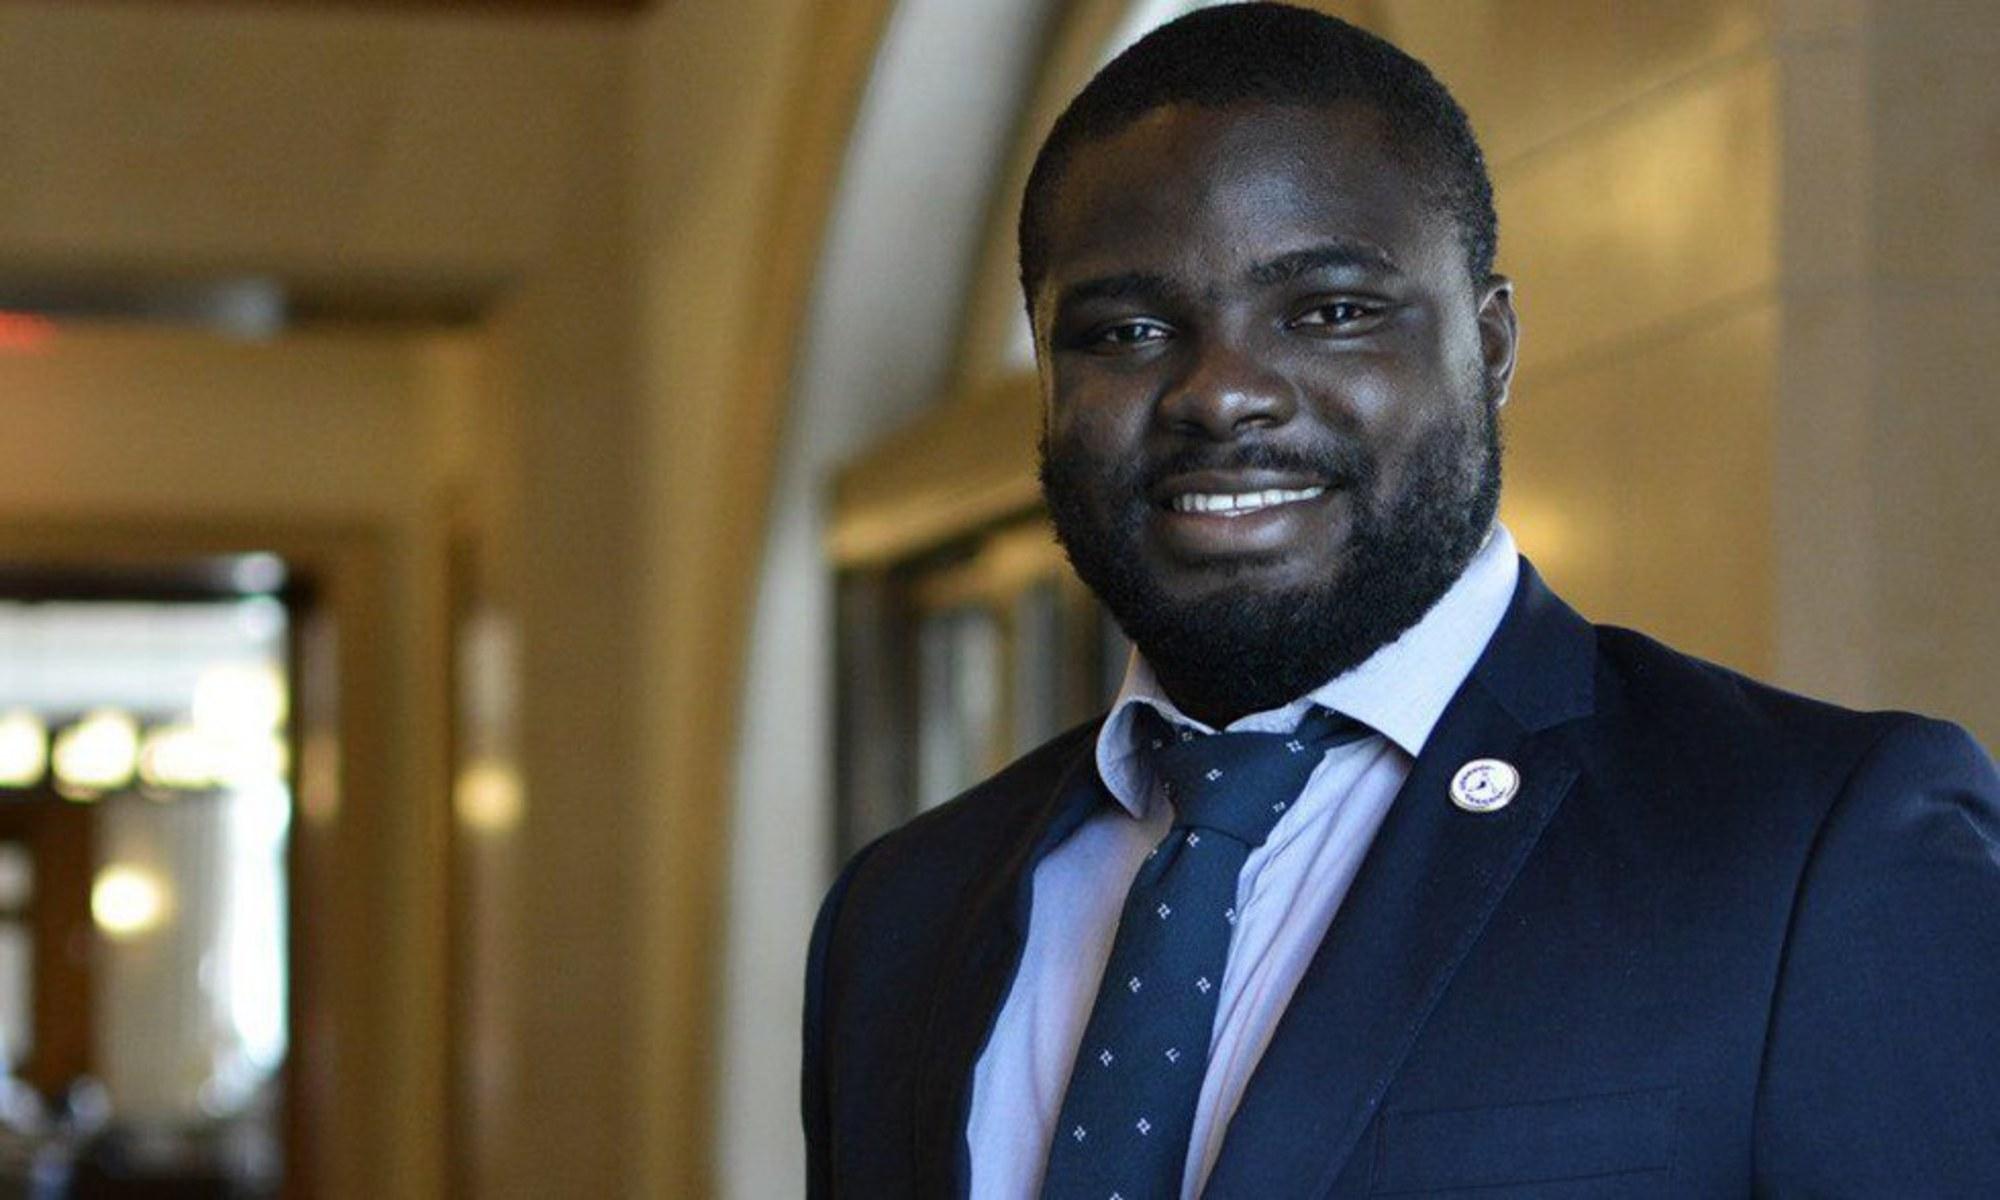 Nigerian Payment Company, Flutterwave Raises $170 million, Tops $1B in Valuation